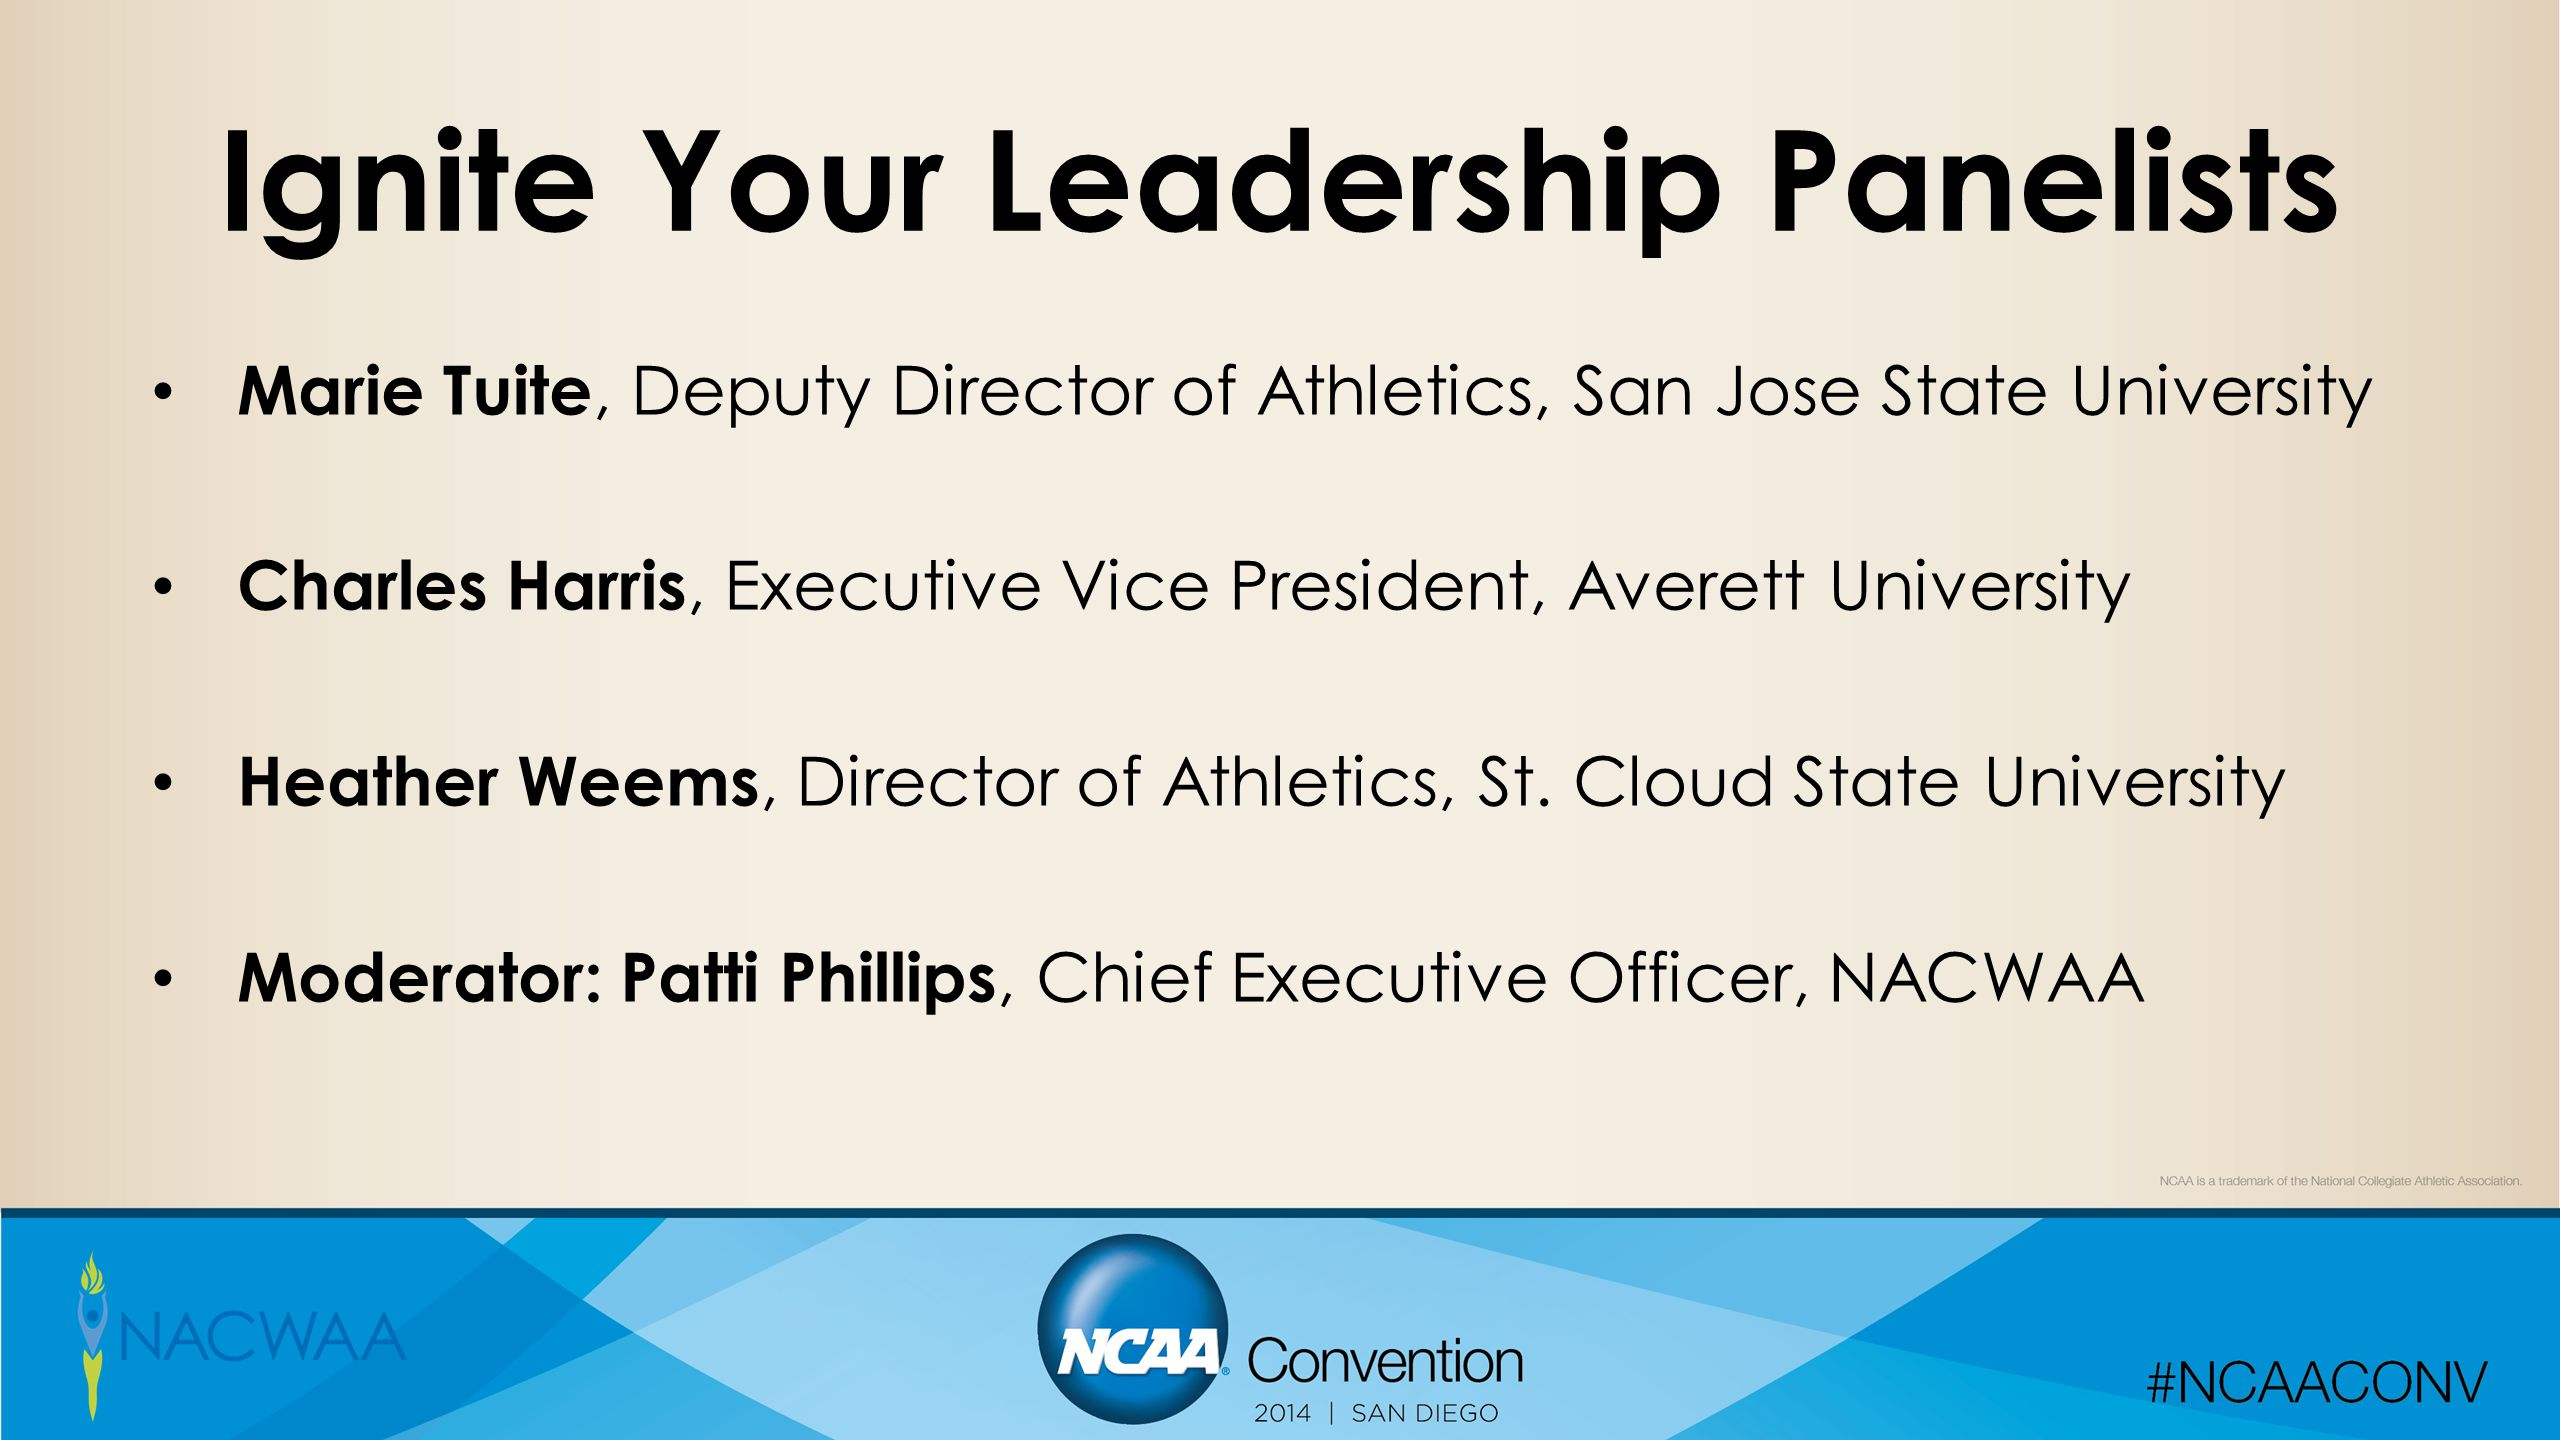 Ignite Your Leadership Panelists Marie Tuite, Deputy Director of Athletics, San Jose State University Charles Harris, Executive Vice President, Averet